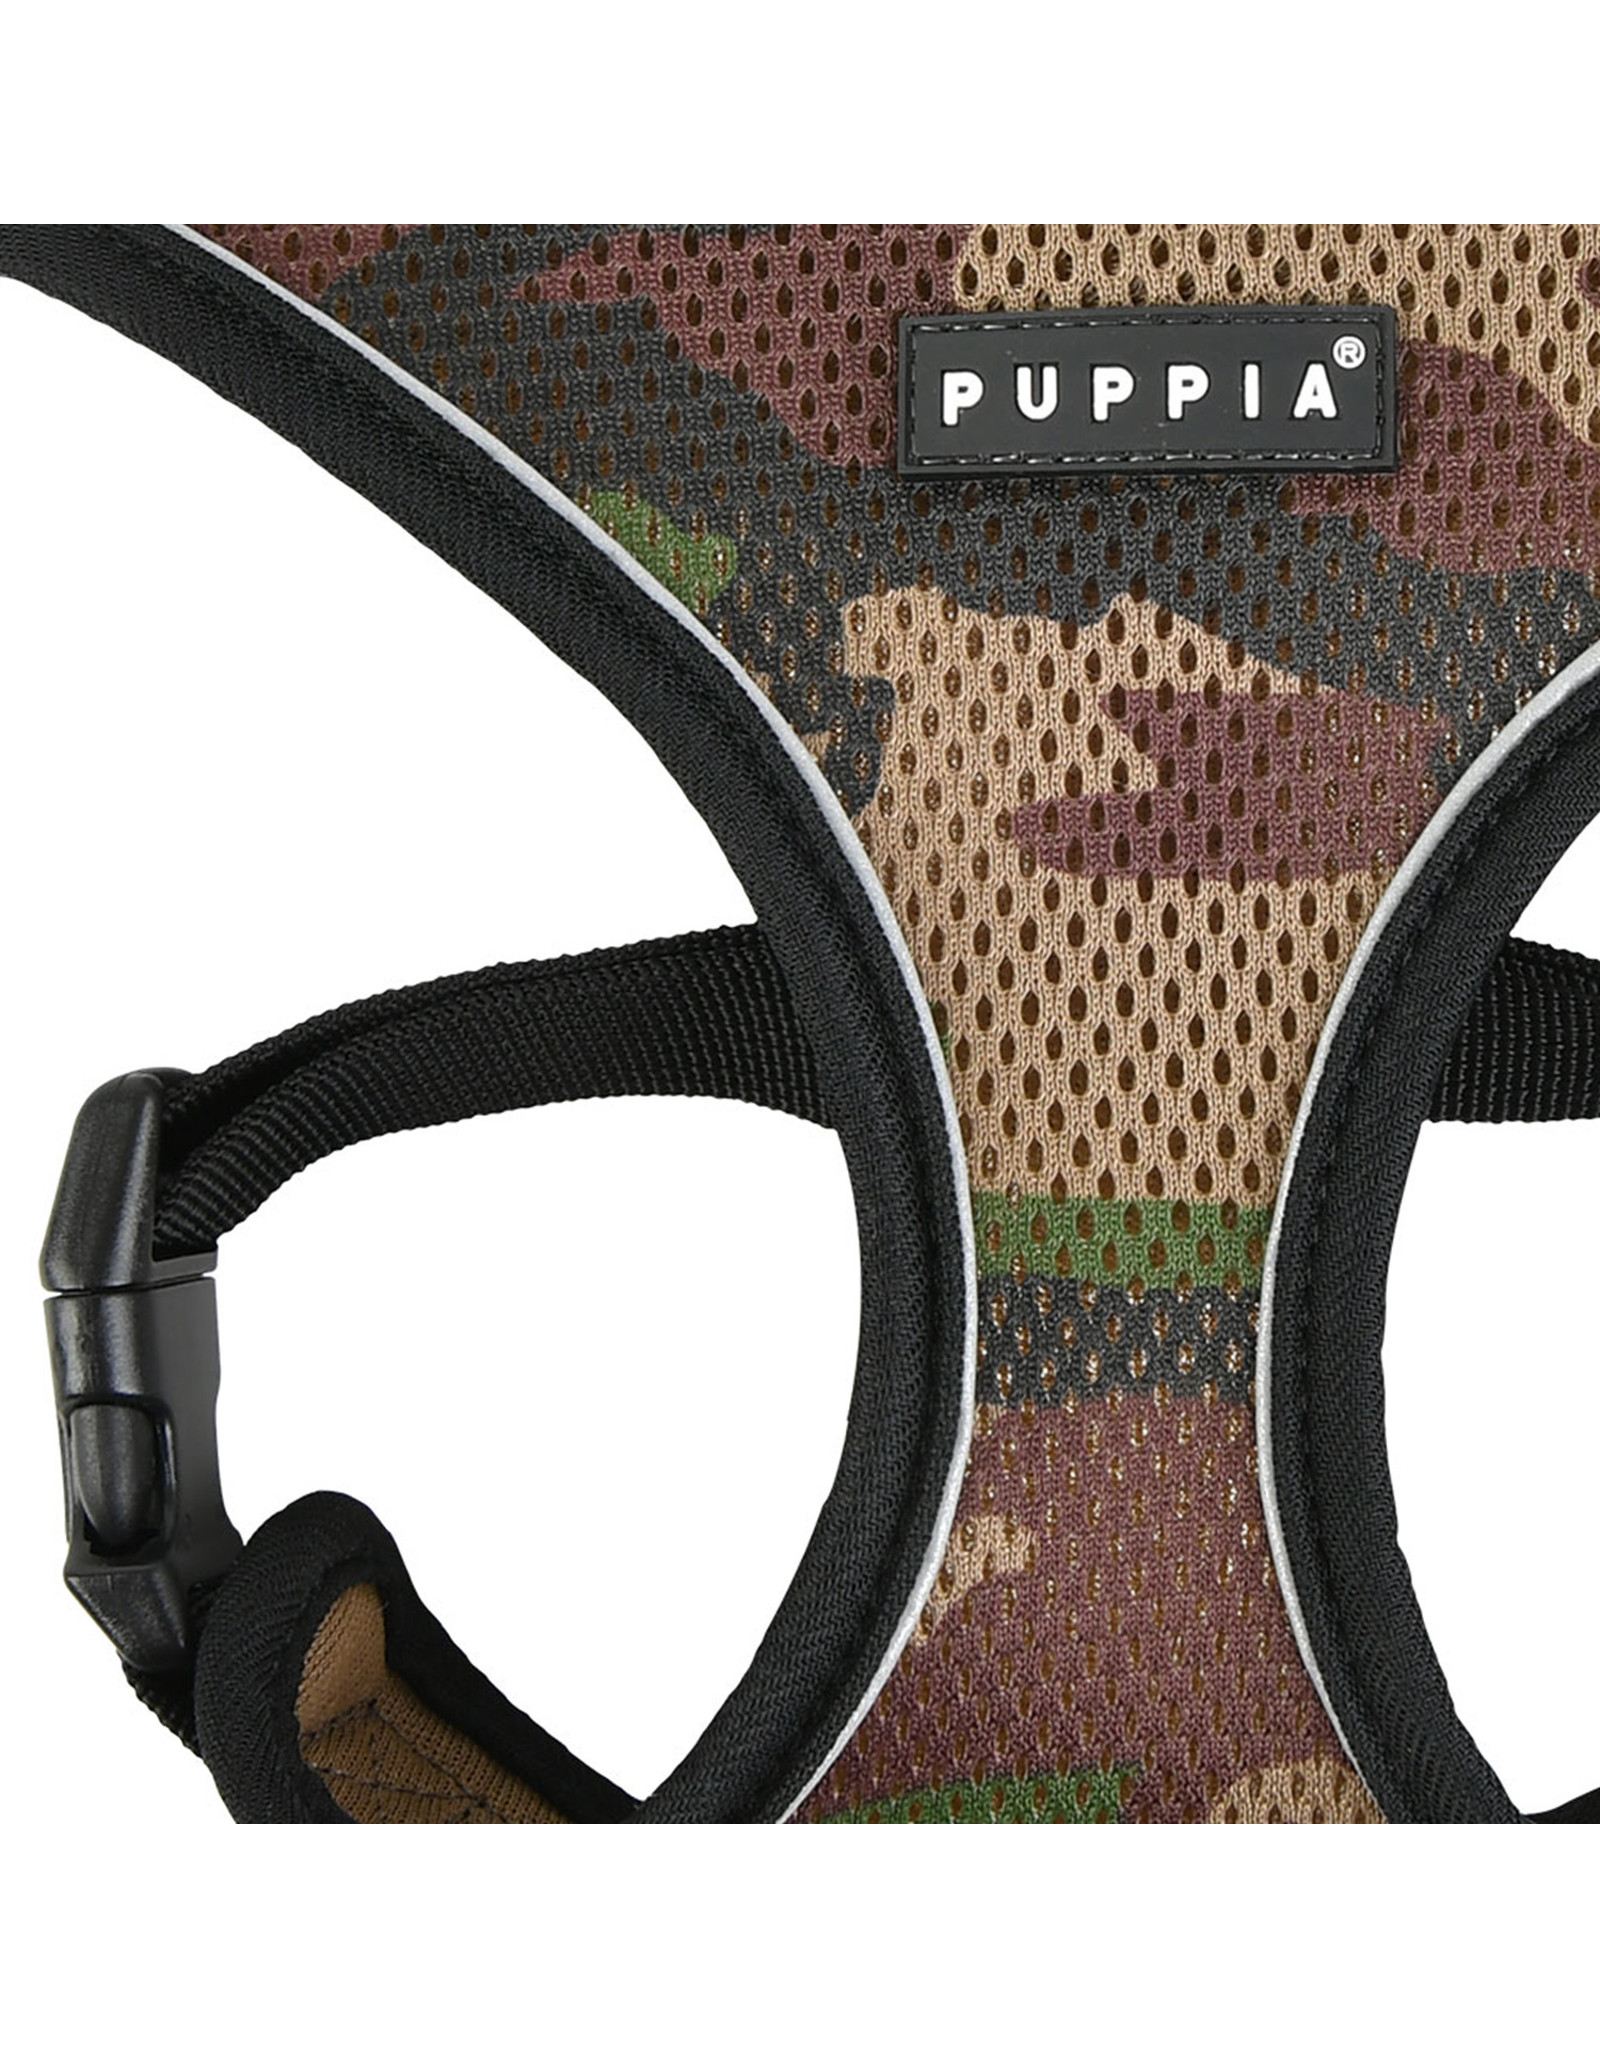 Puppia Puppia Soft Harness PRO model A Camo